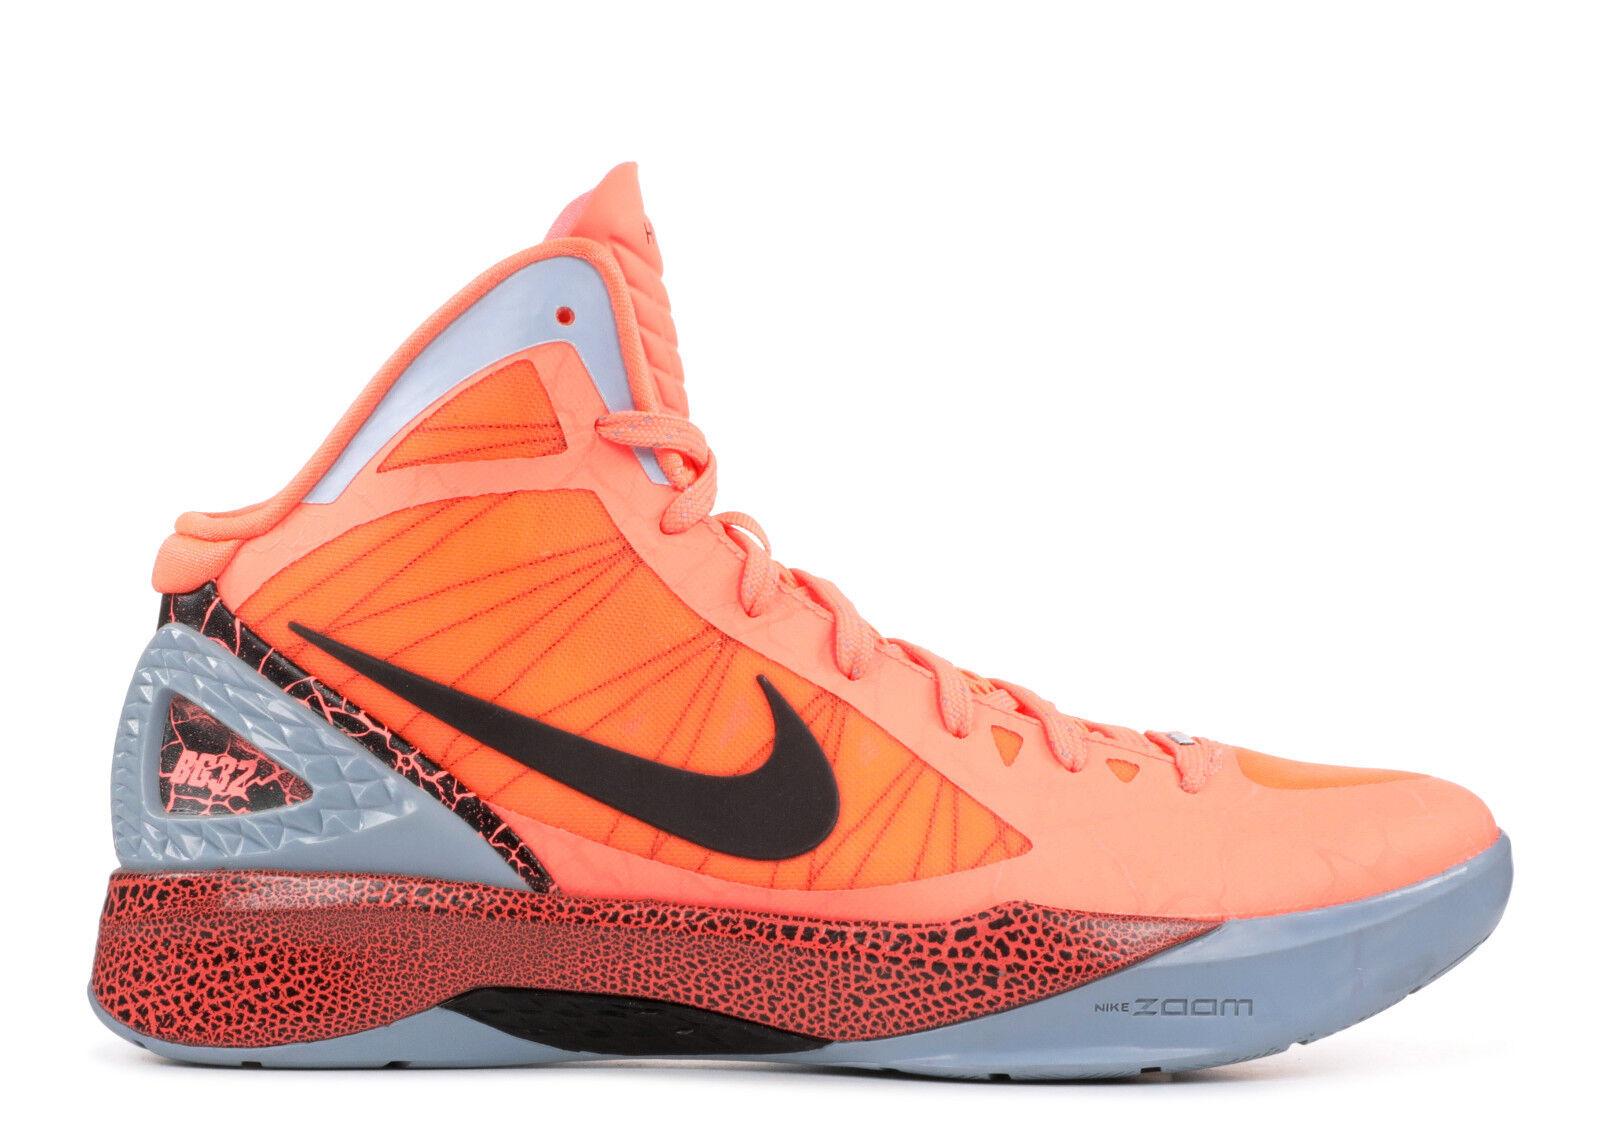 Nike Zoom Hyperdunk 2011 BG Talla 9 Blake Griffin PE Brillante Mango AS 484935-800